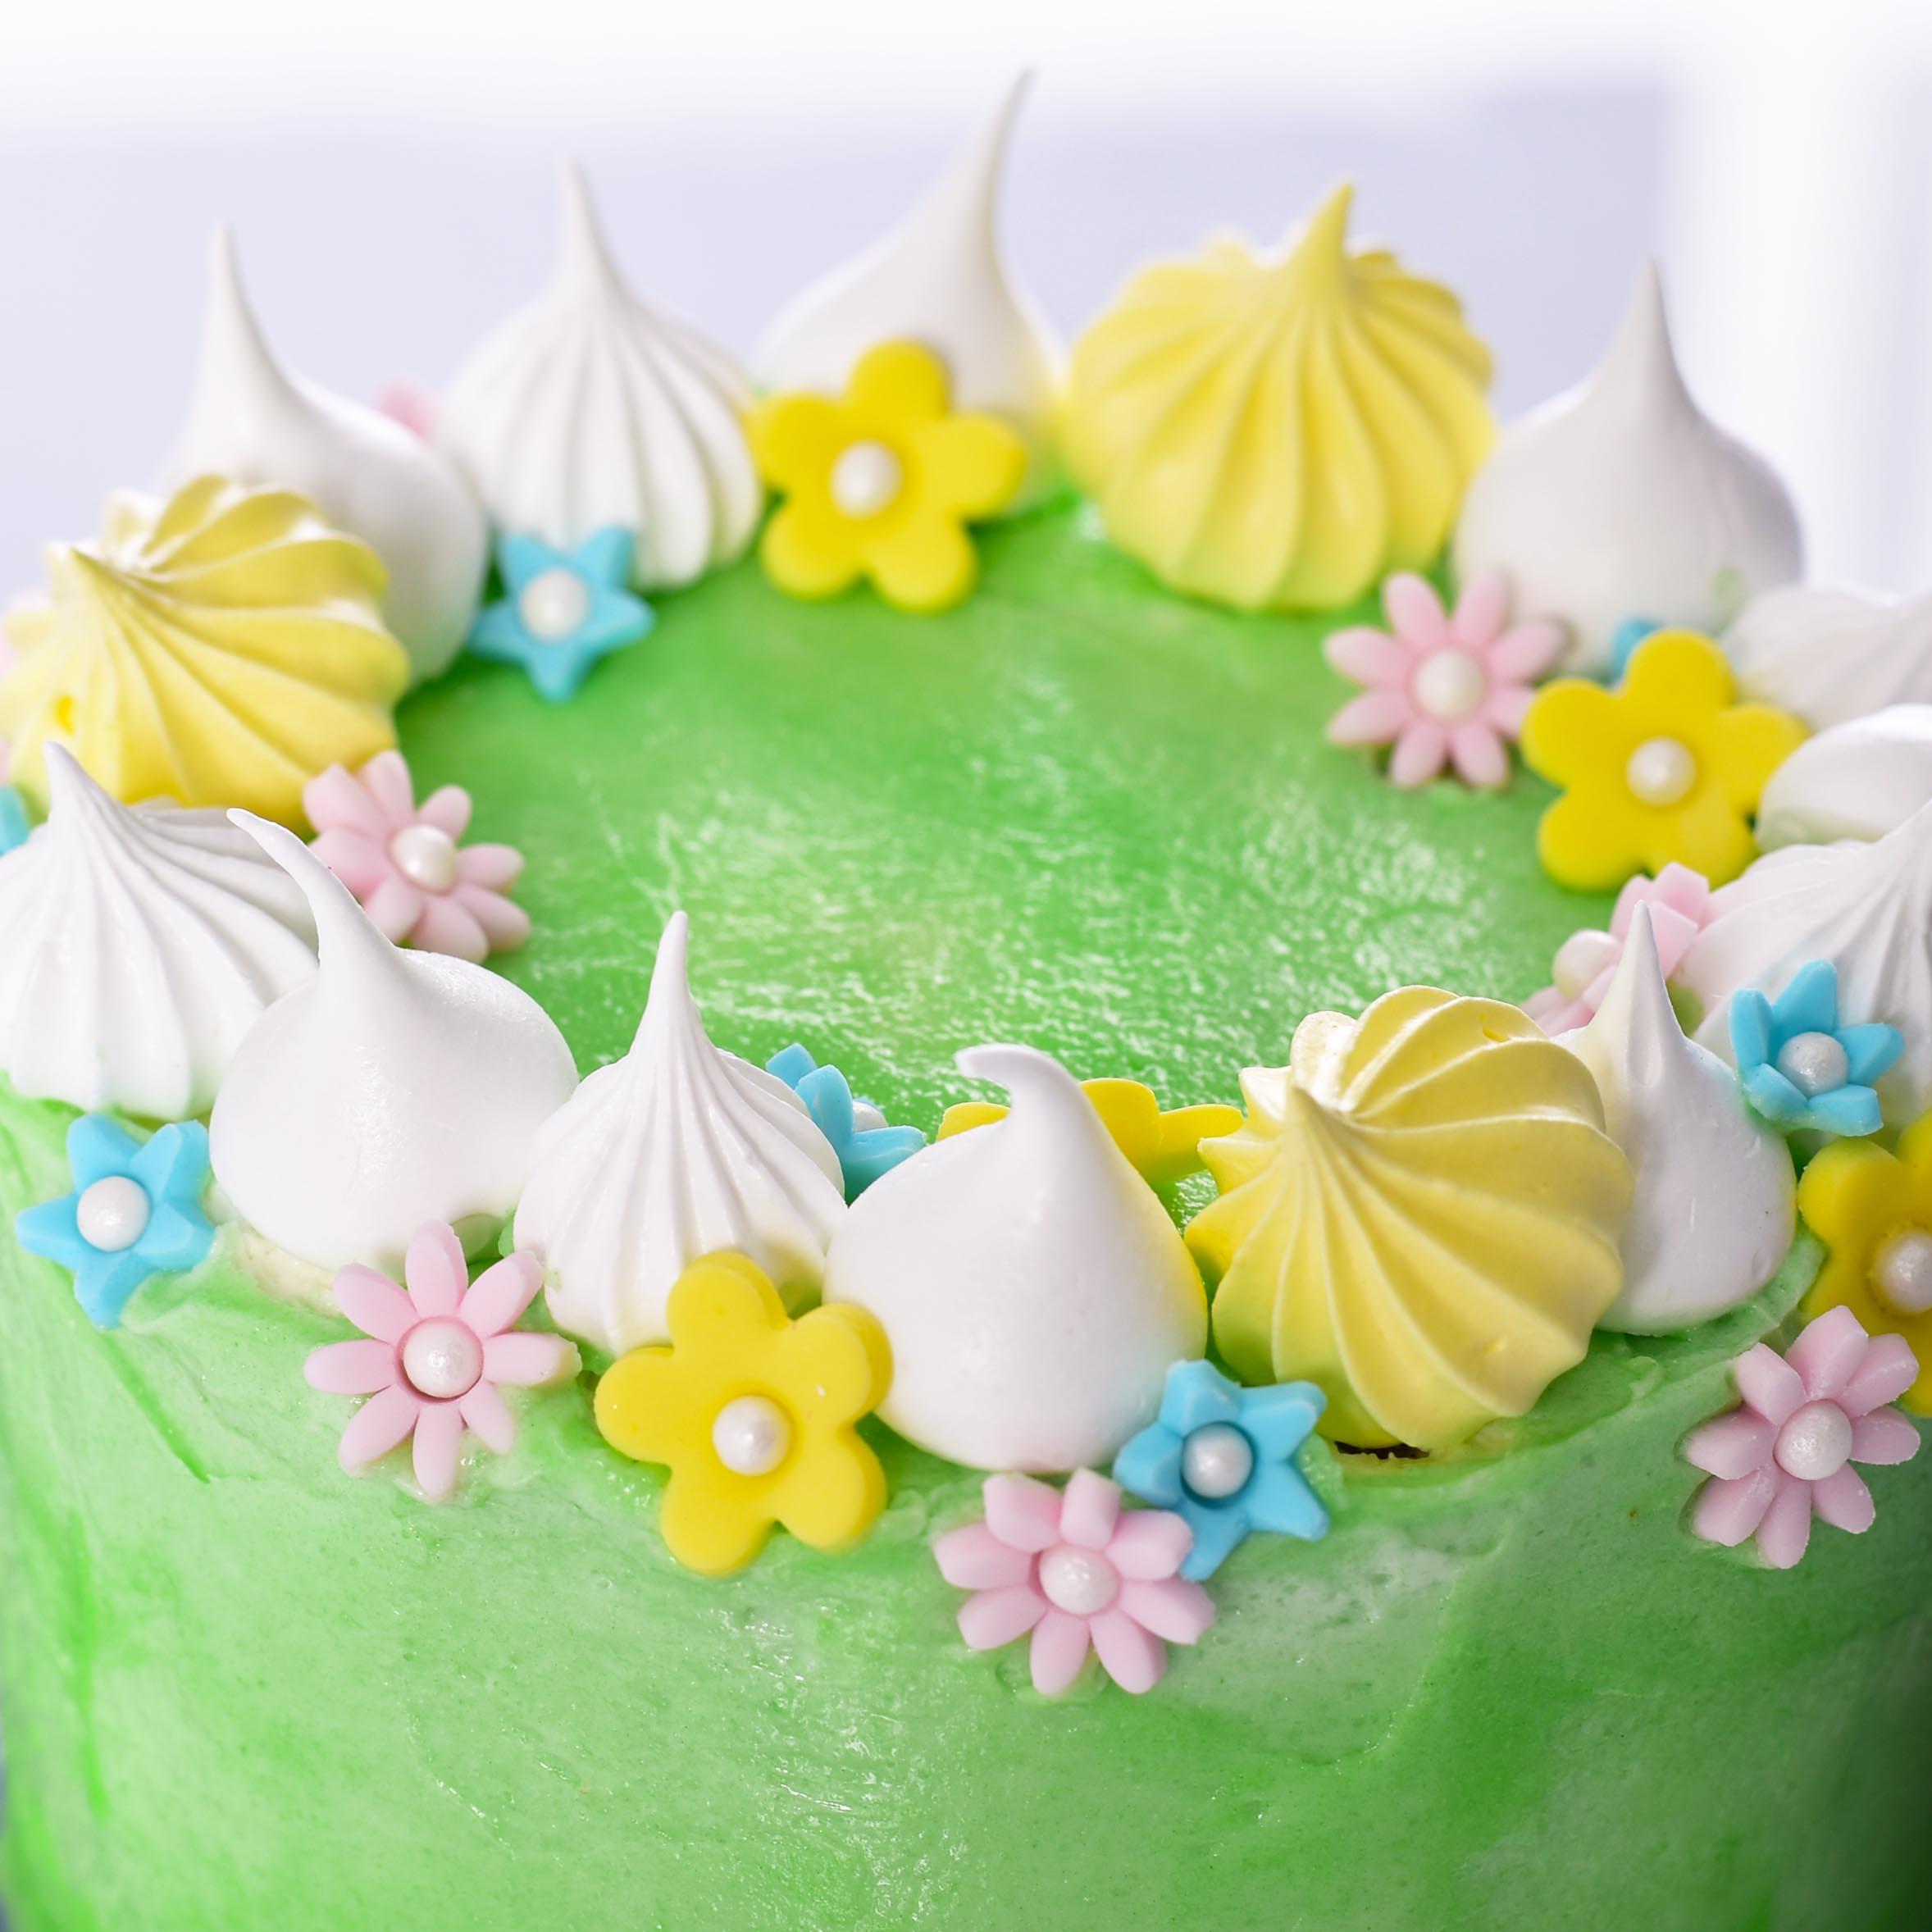 Easter Bunny in the Garden Cake